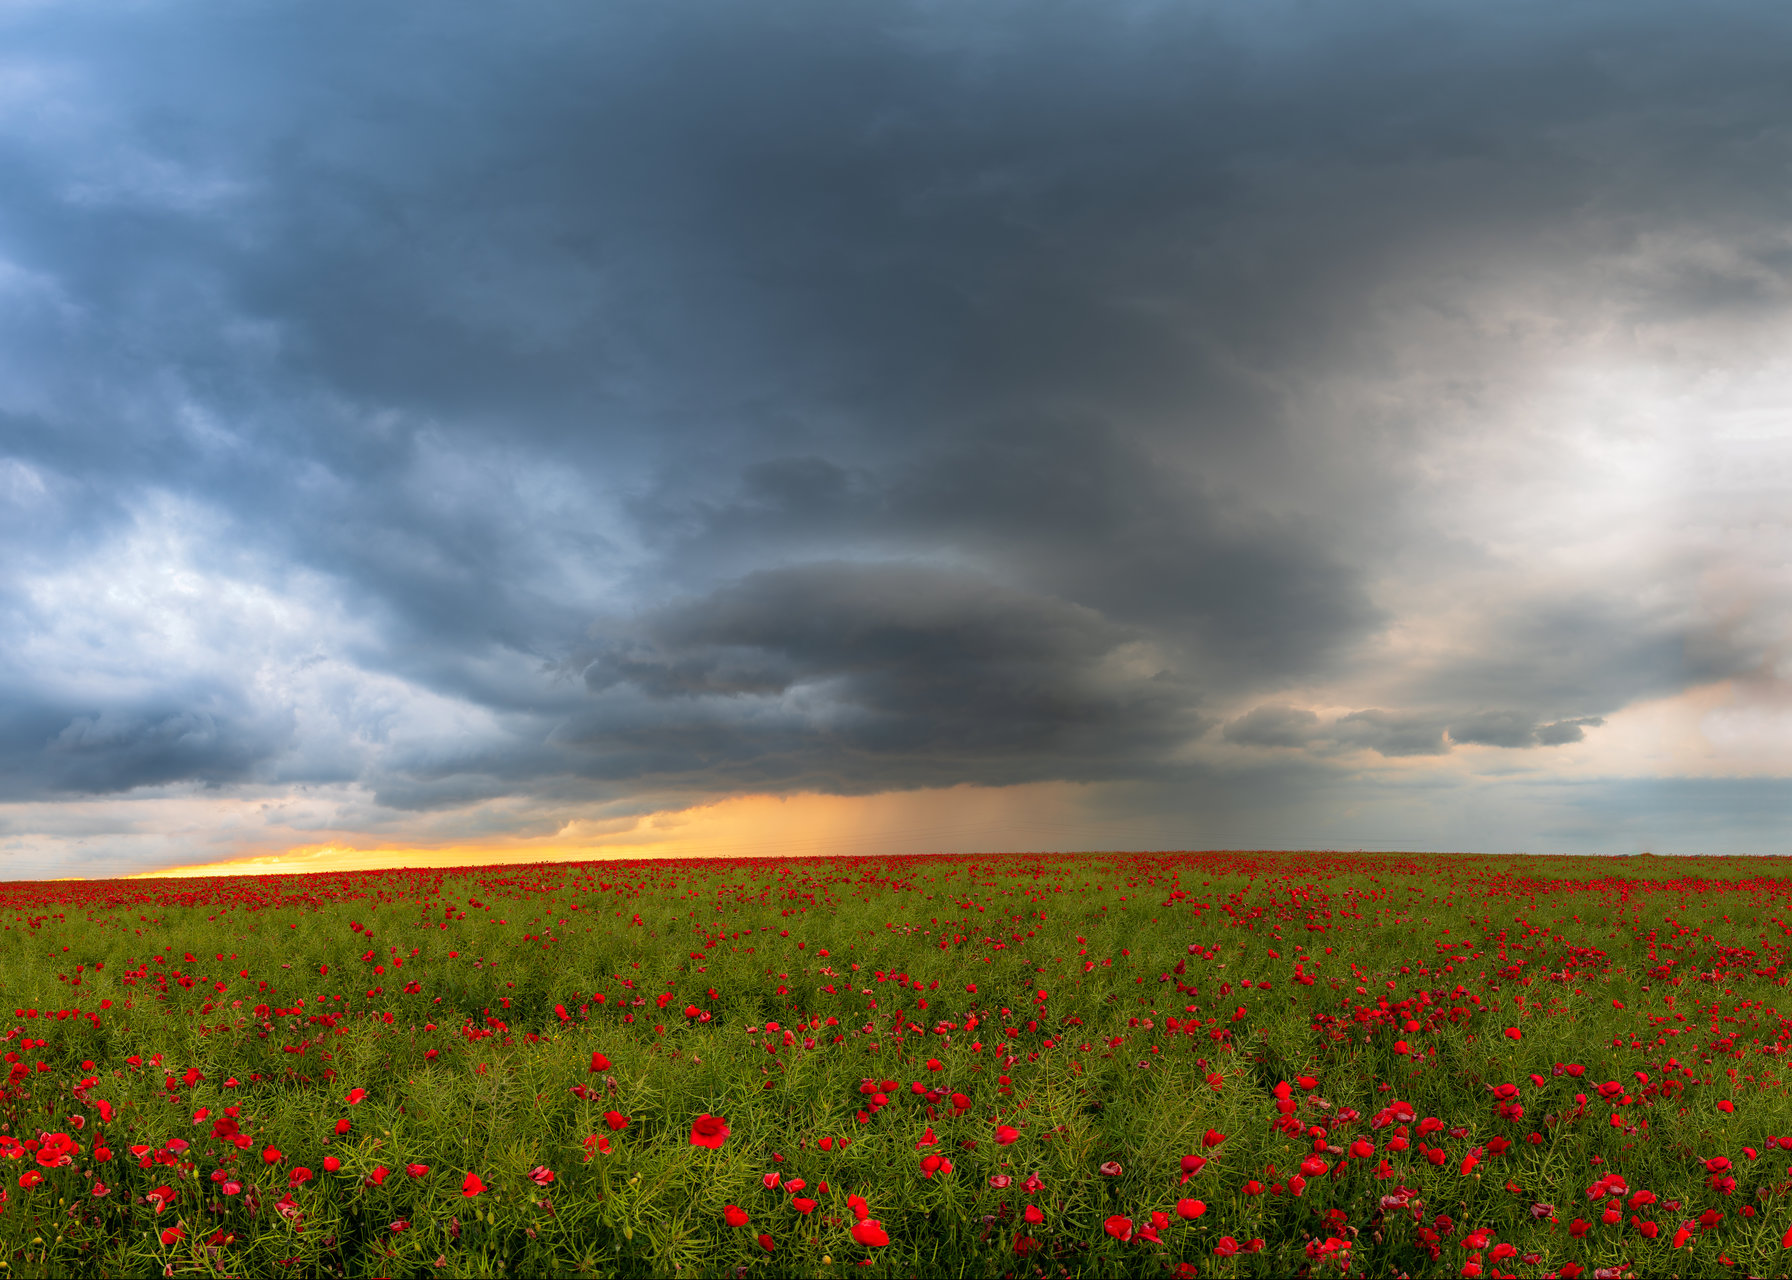 Бурята настъпва | Author Иво Герасимов - ubobg | PHOTO FORUM